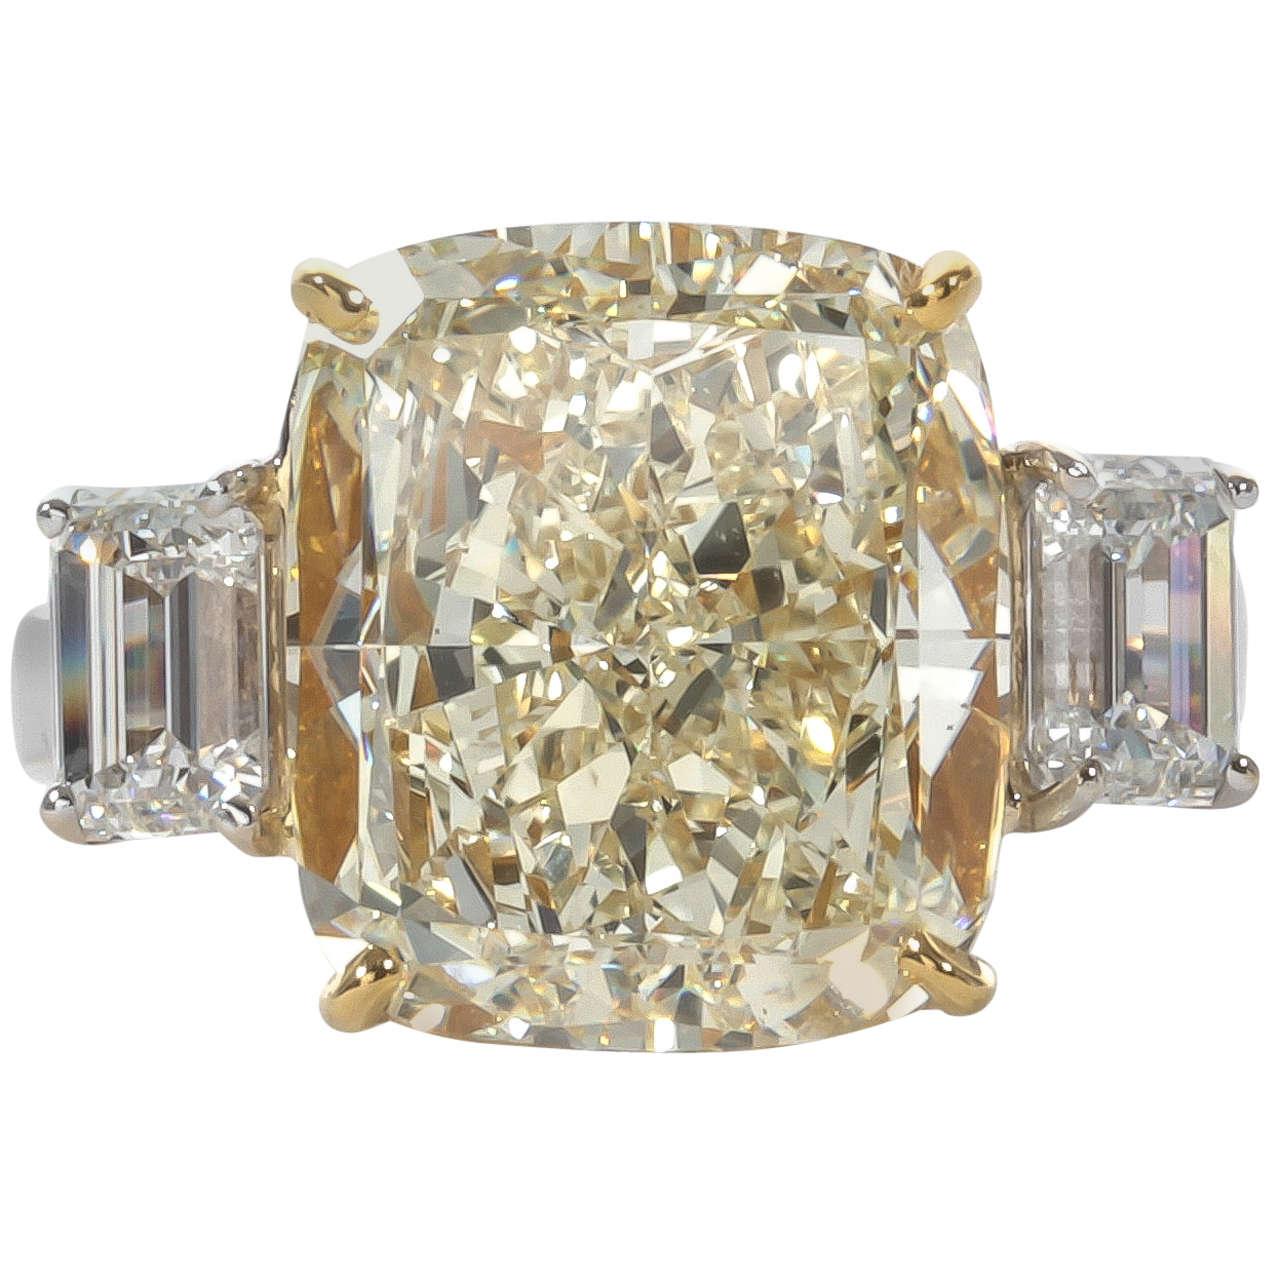 Fancy Yellow 10 06 Carat Cushion Cut Diamond Ring at 1stdibs